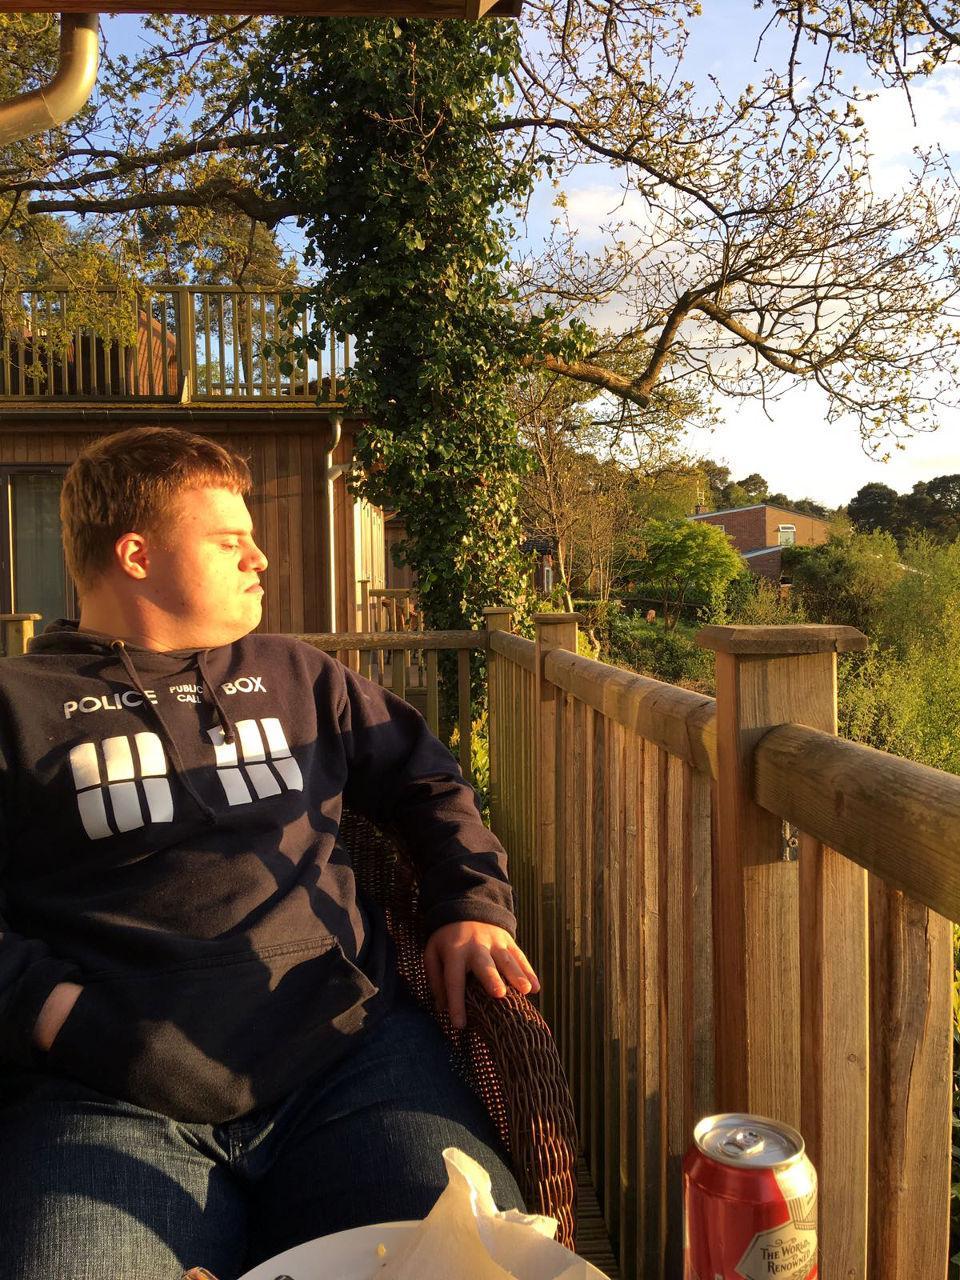 Paul in profile enjoying the sunset.